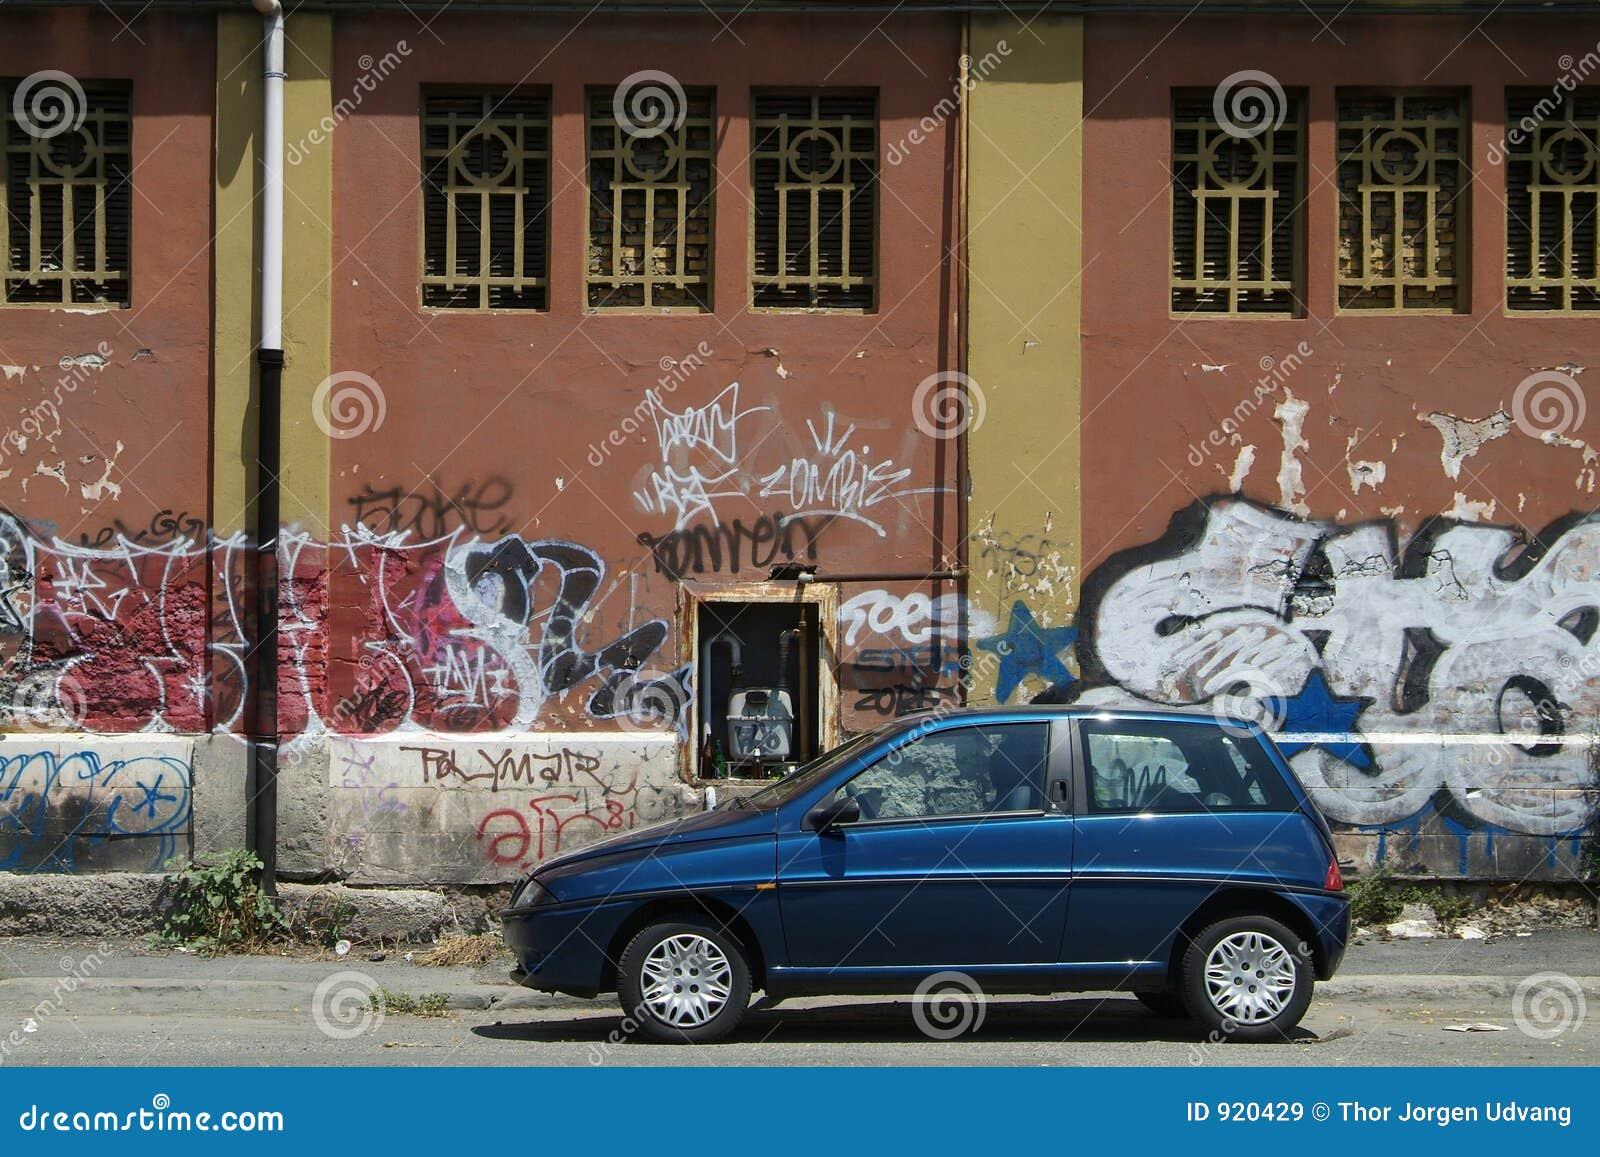 Véhicule et graffiti